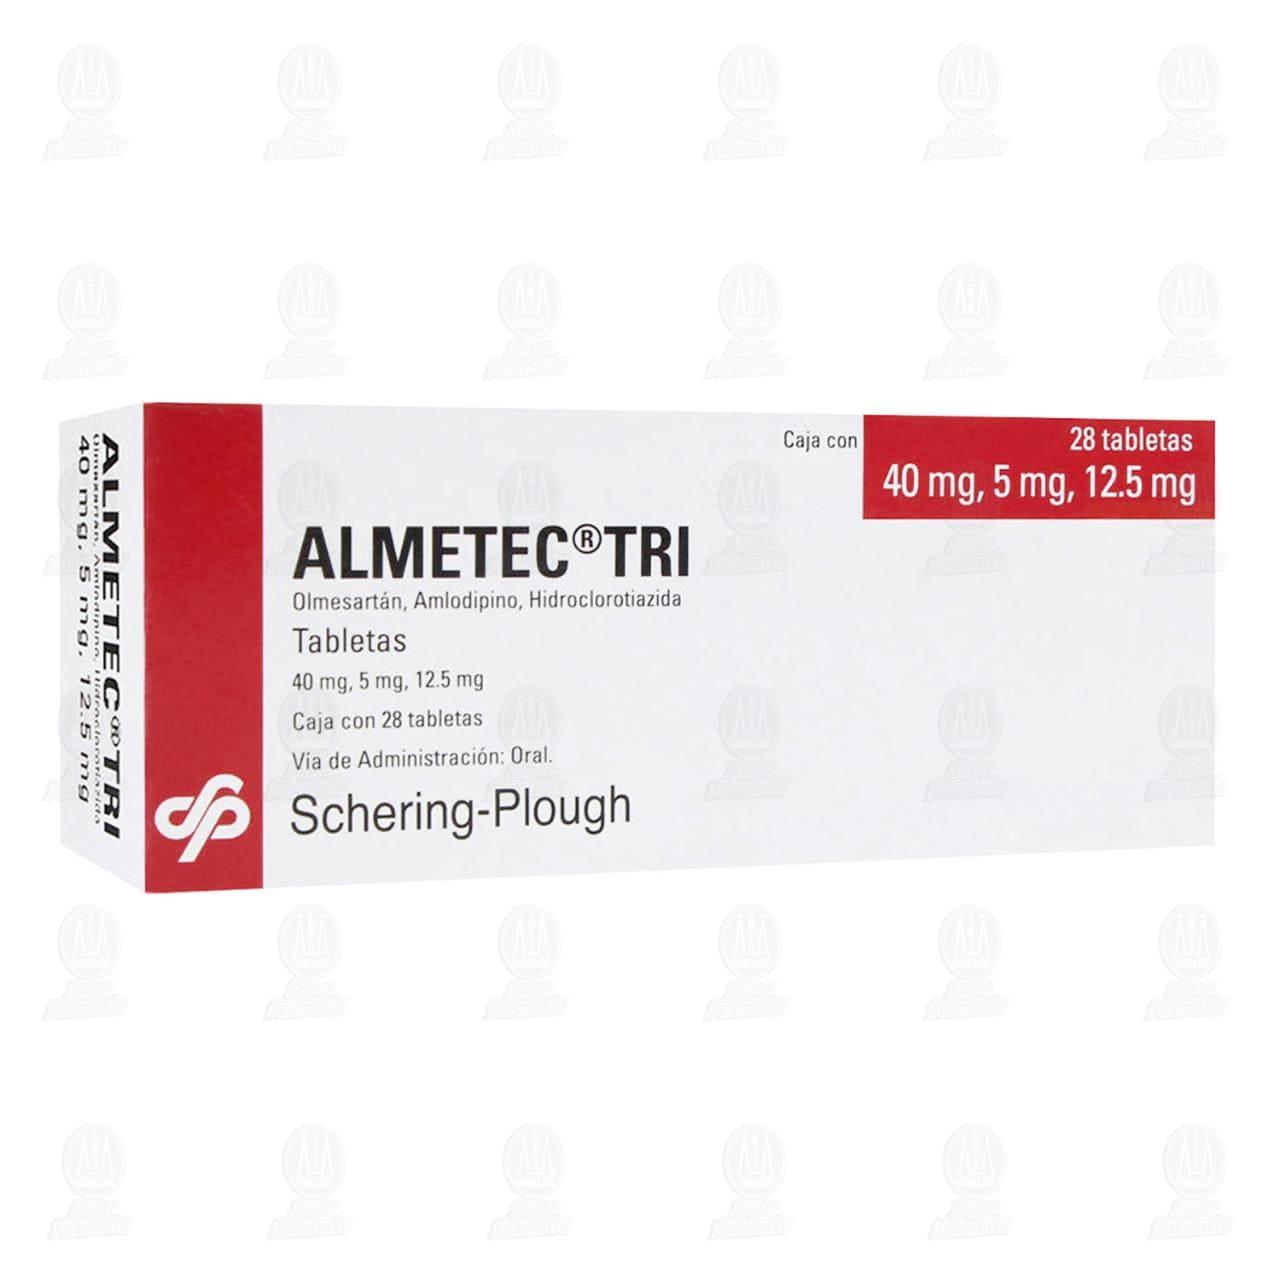 Comprar Almetec Tri 40mg/5mg/12.5mg 28 Tabletas en Farmacias Guadalajara